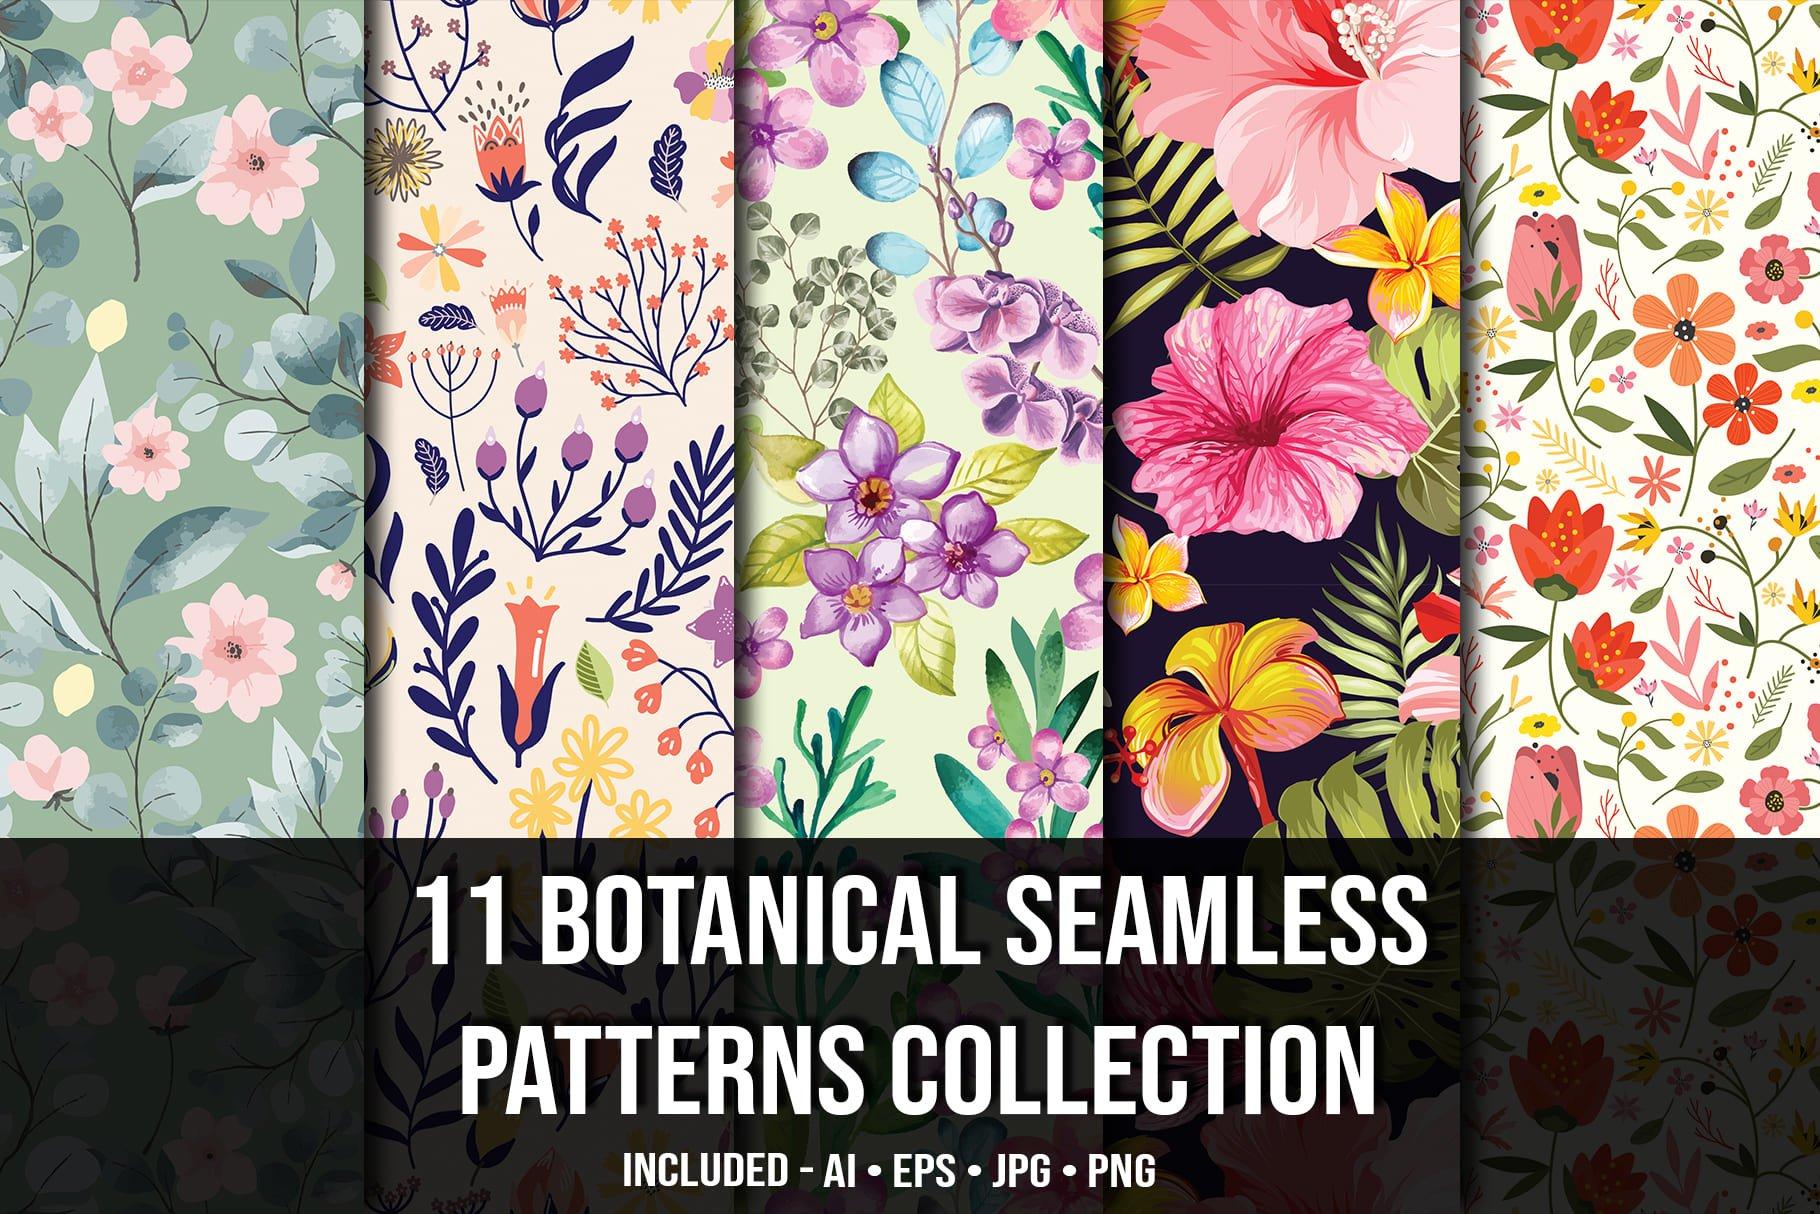 Main image.Botanical Seamless Pattern Collection.